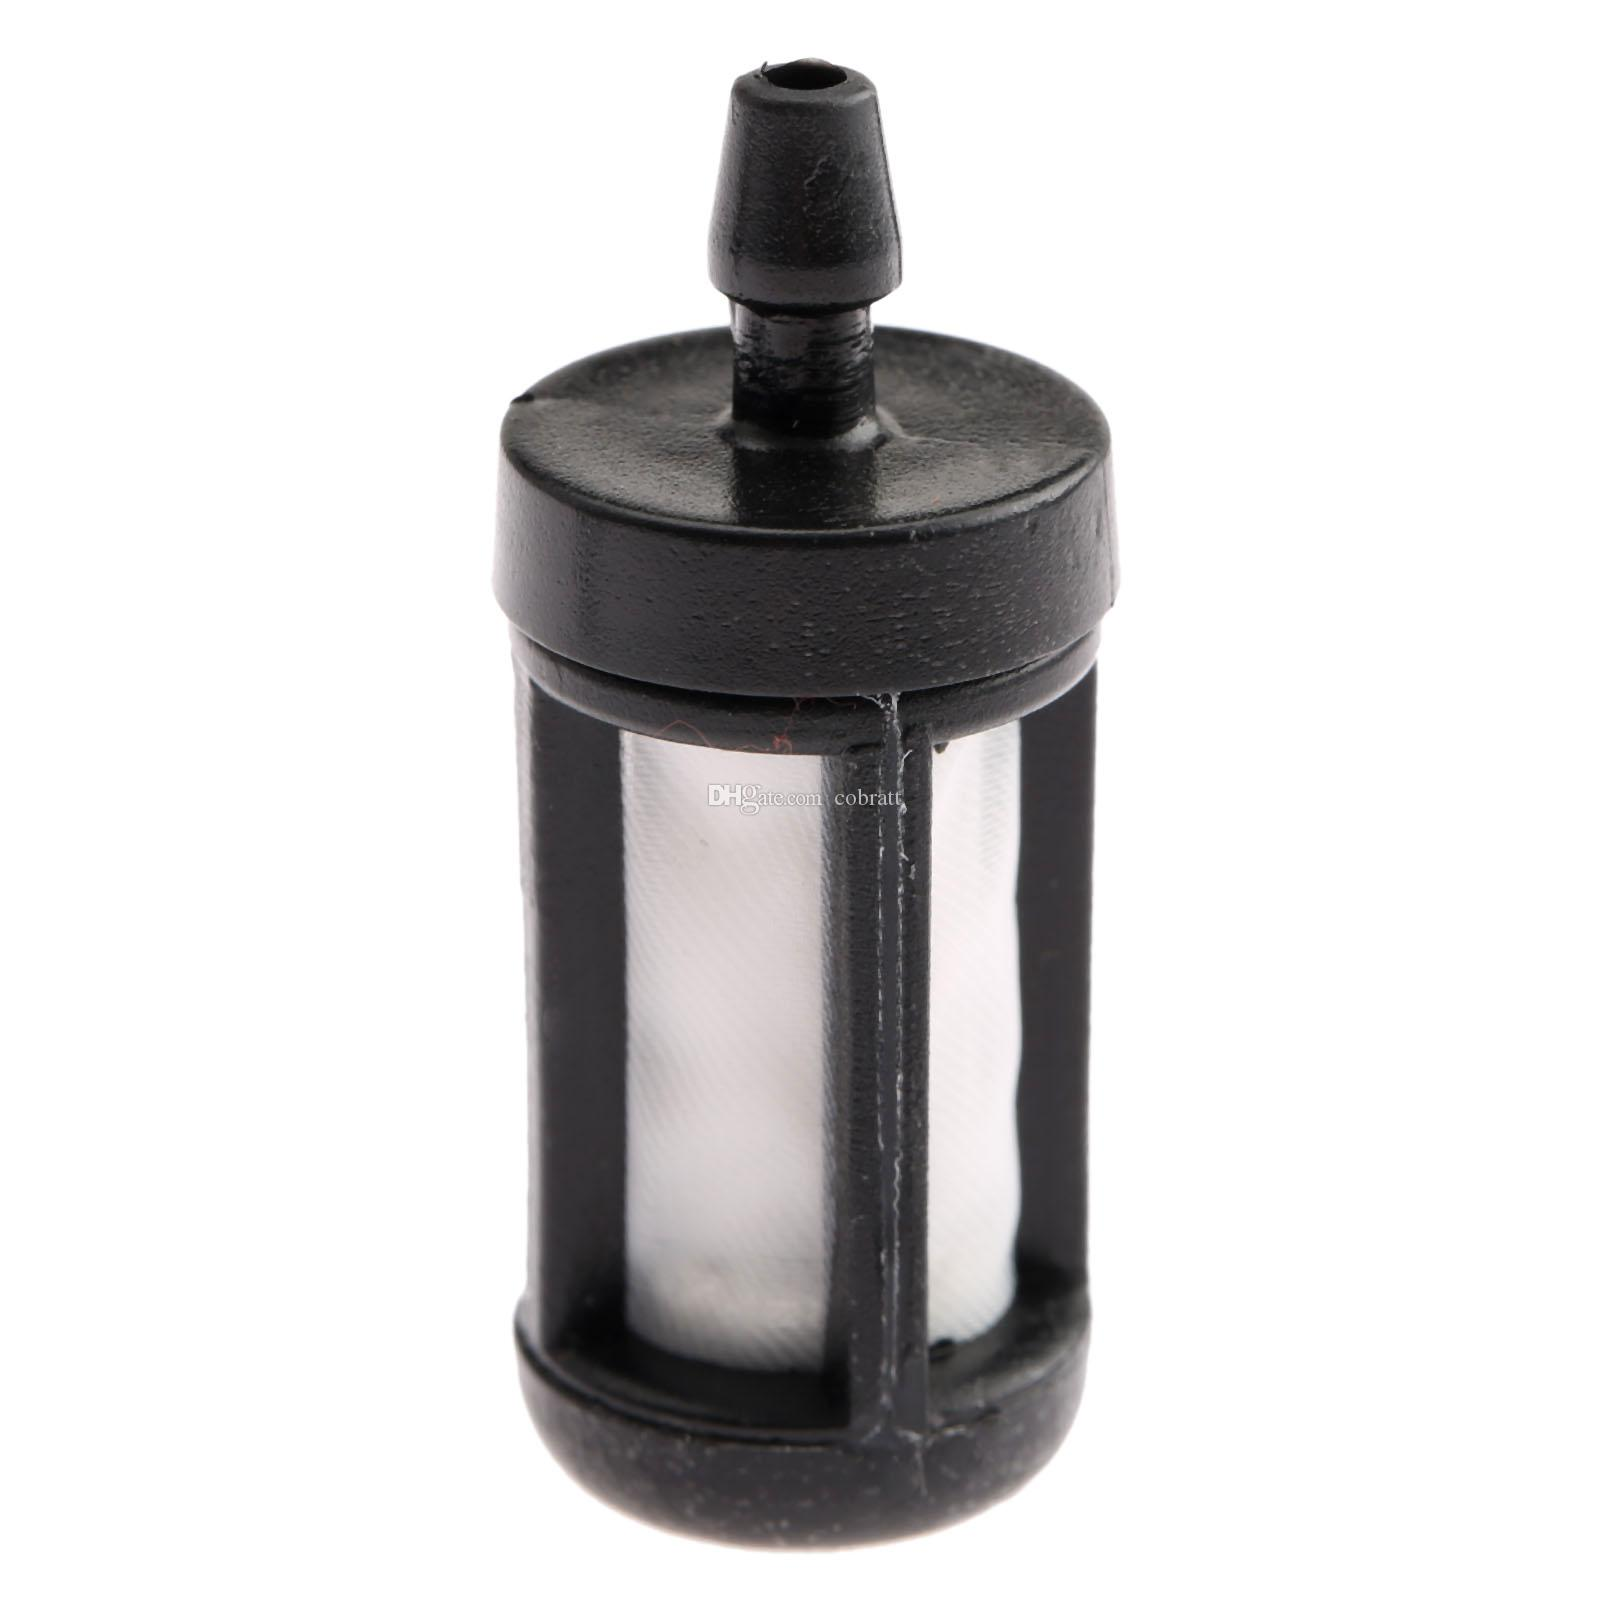 4 X Fuel Filter For Atlas Copco Cobra Tt Breaker Replacement Part Vanguard Online With 164 Piece On Cobratts Store